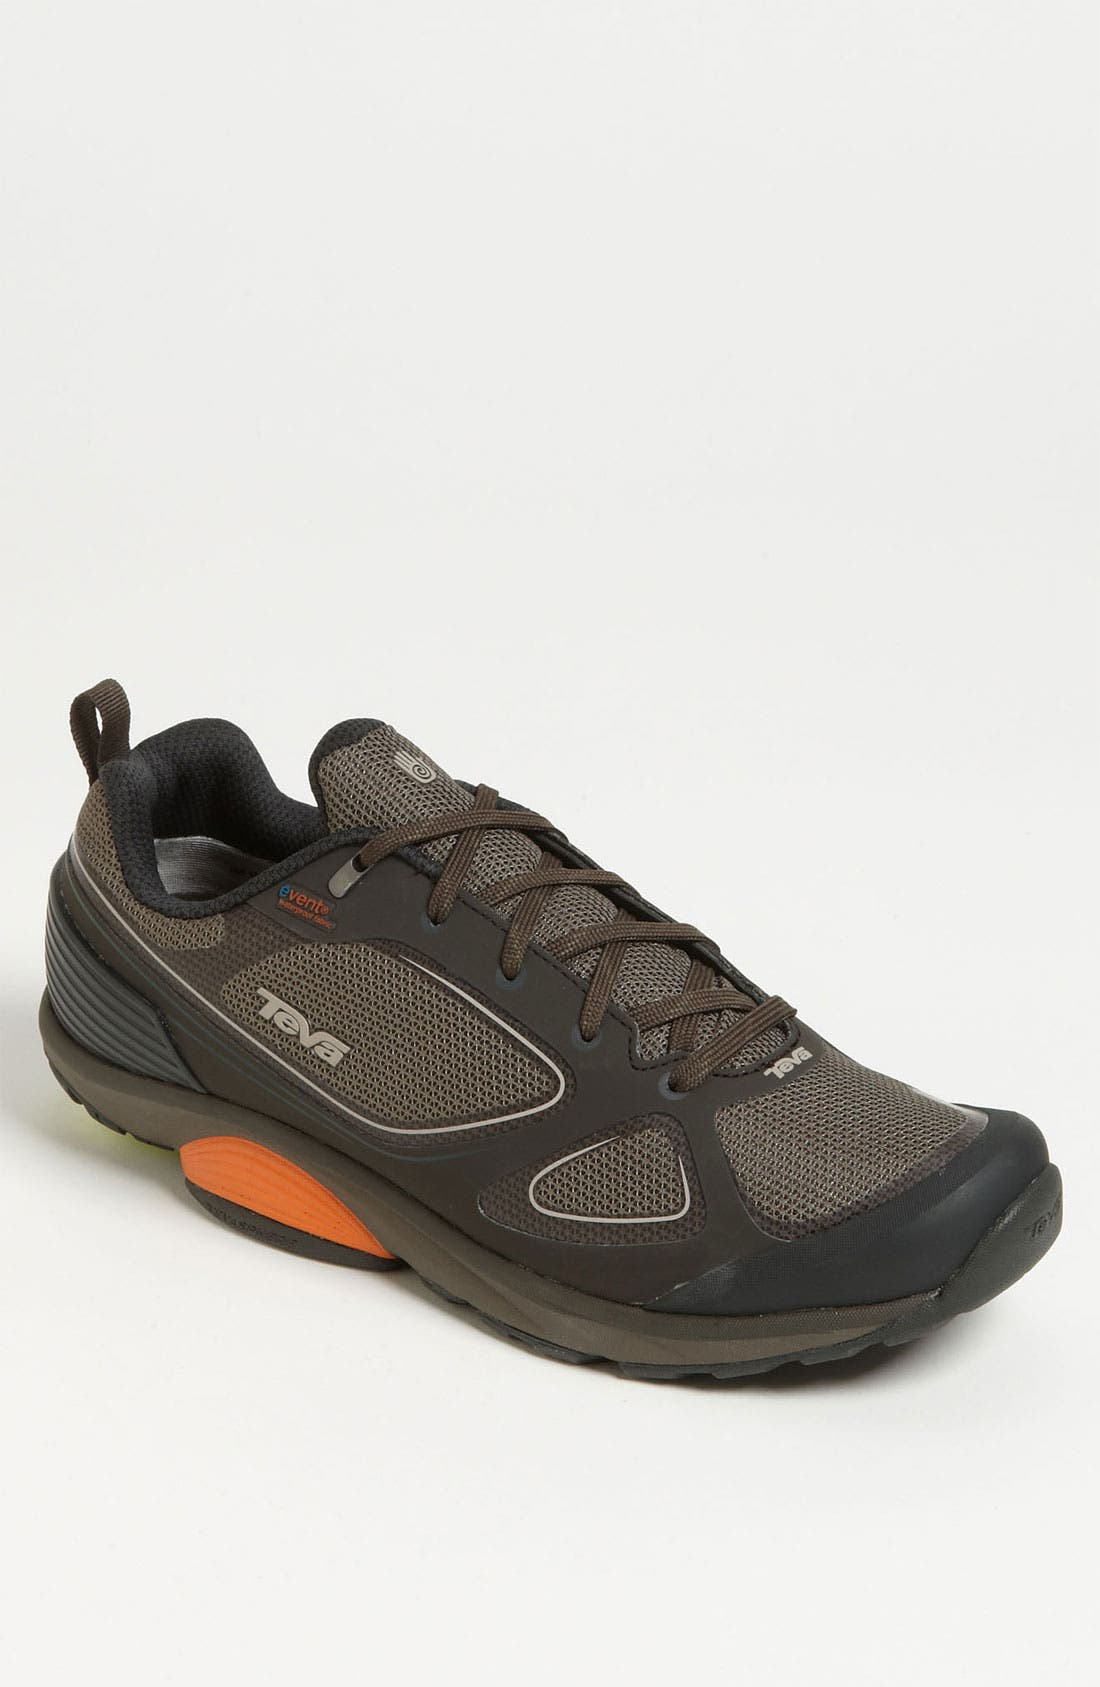 Main Image - Teva 'TevaSphere Trail' Training Shoe (Men)